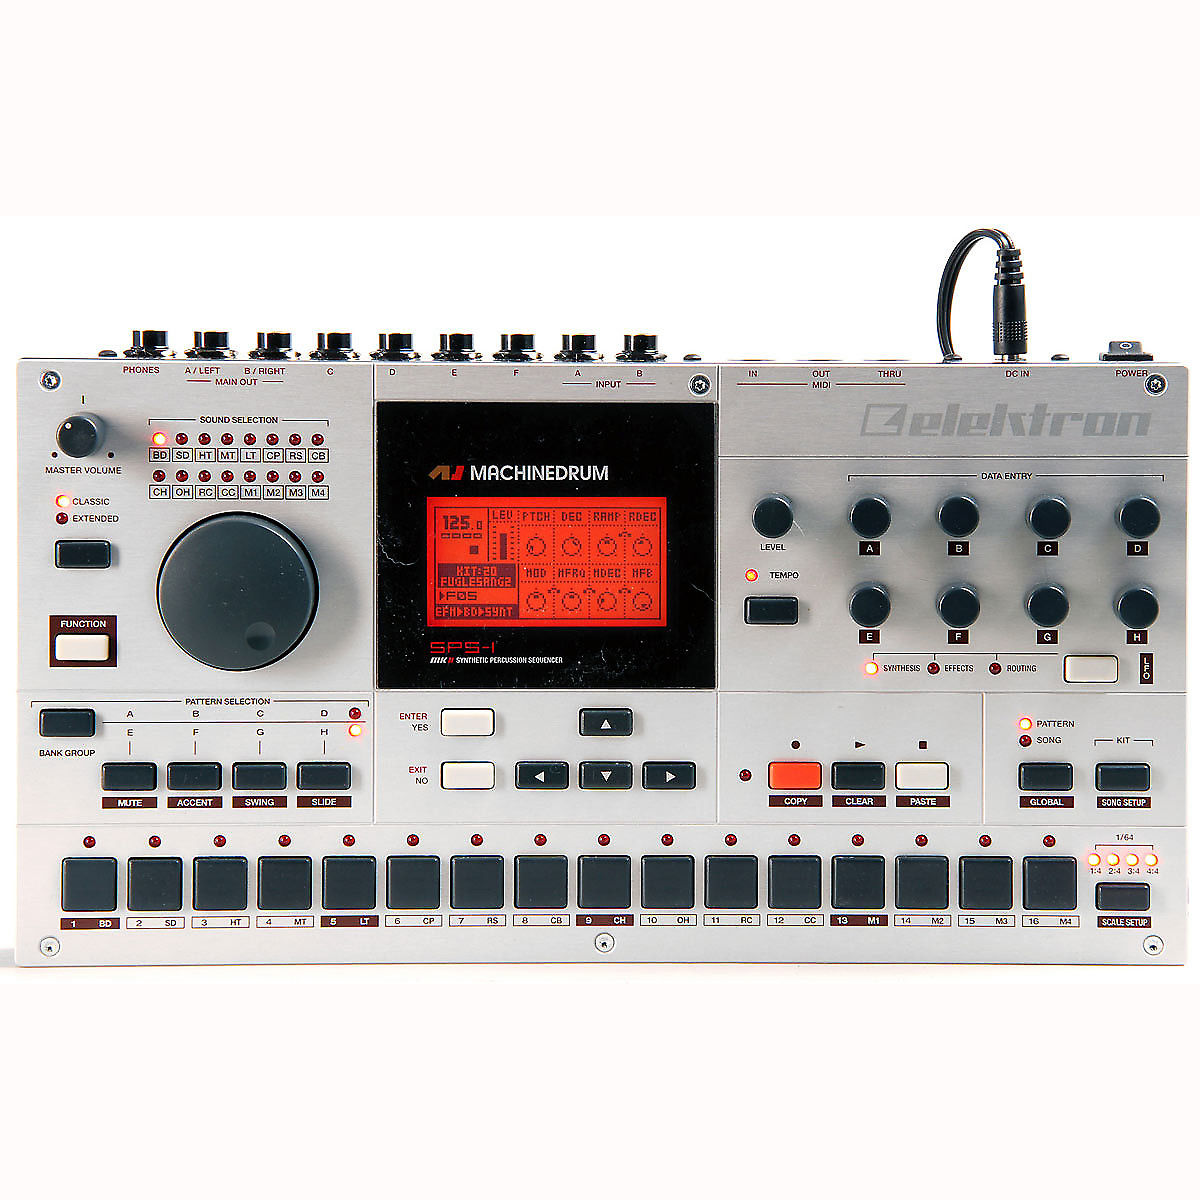 elektron sps 1 machinedrum drum synthesizer sequencer reverb. Black Bedroom Furniture Sets. Home Design Ideas